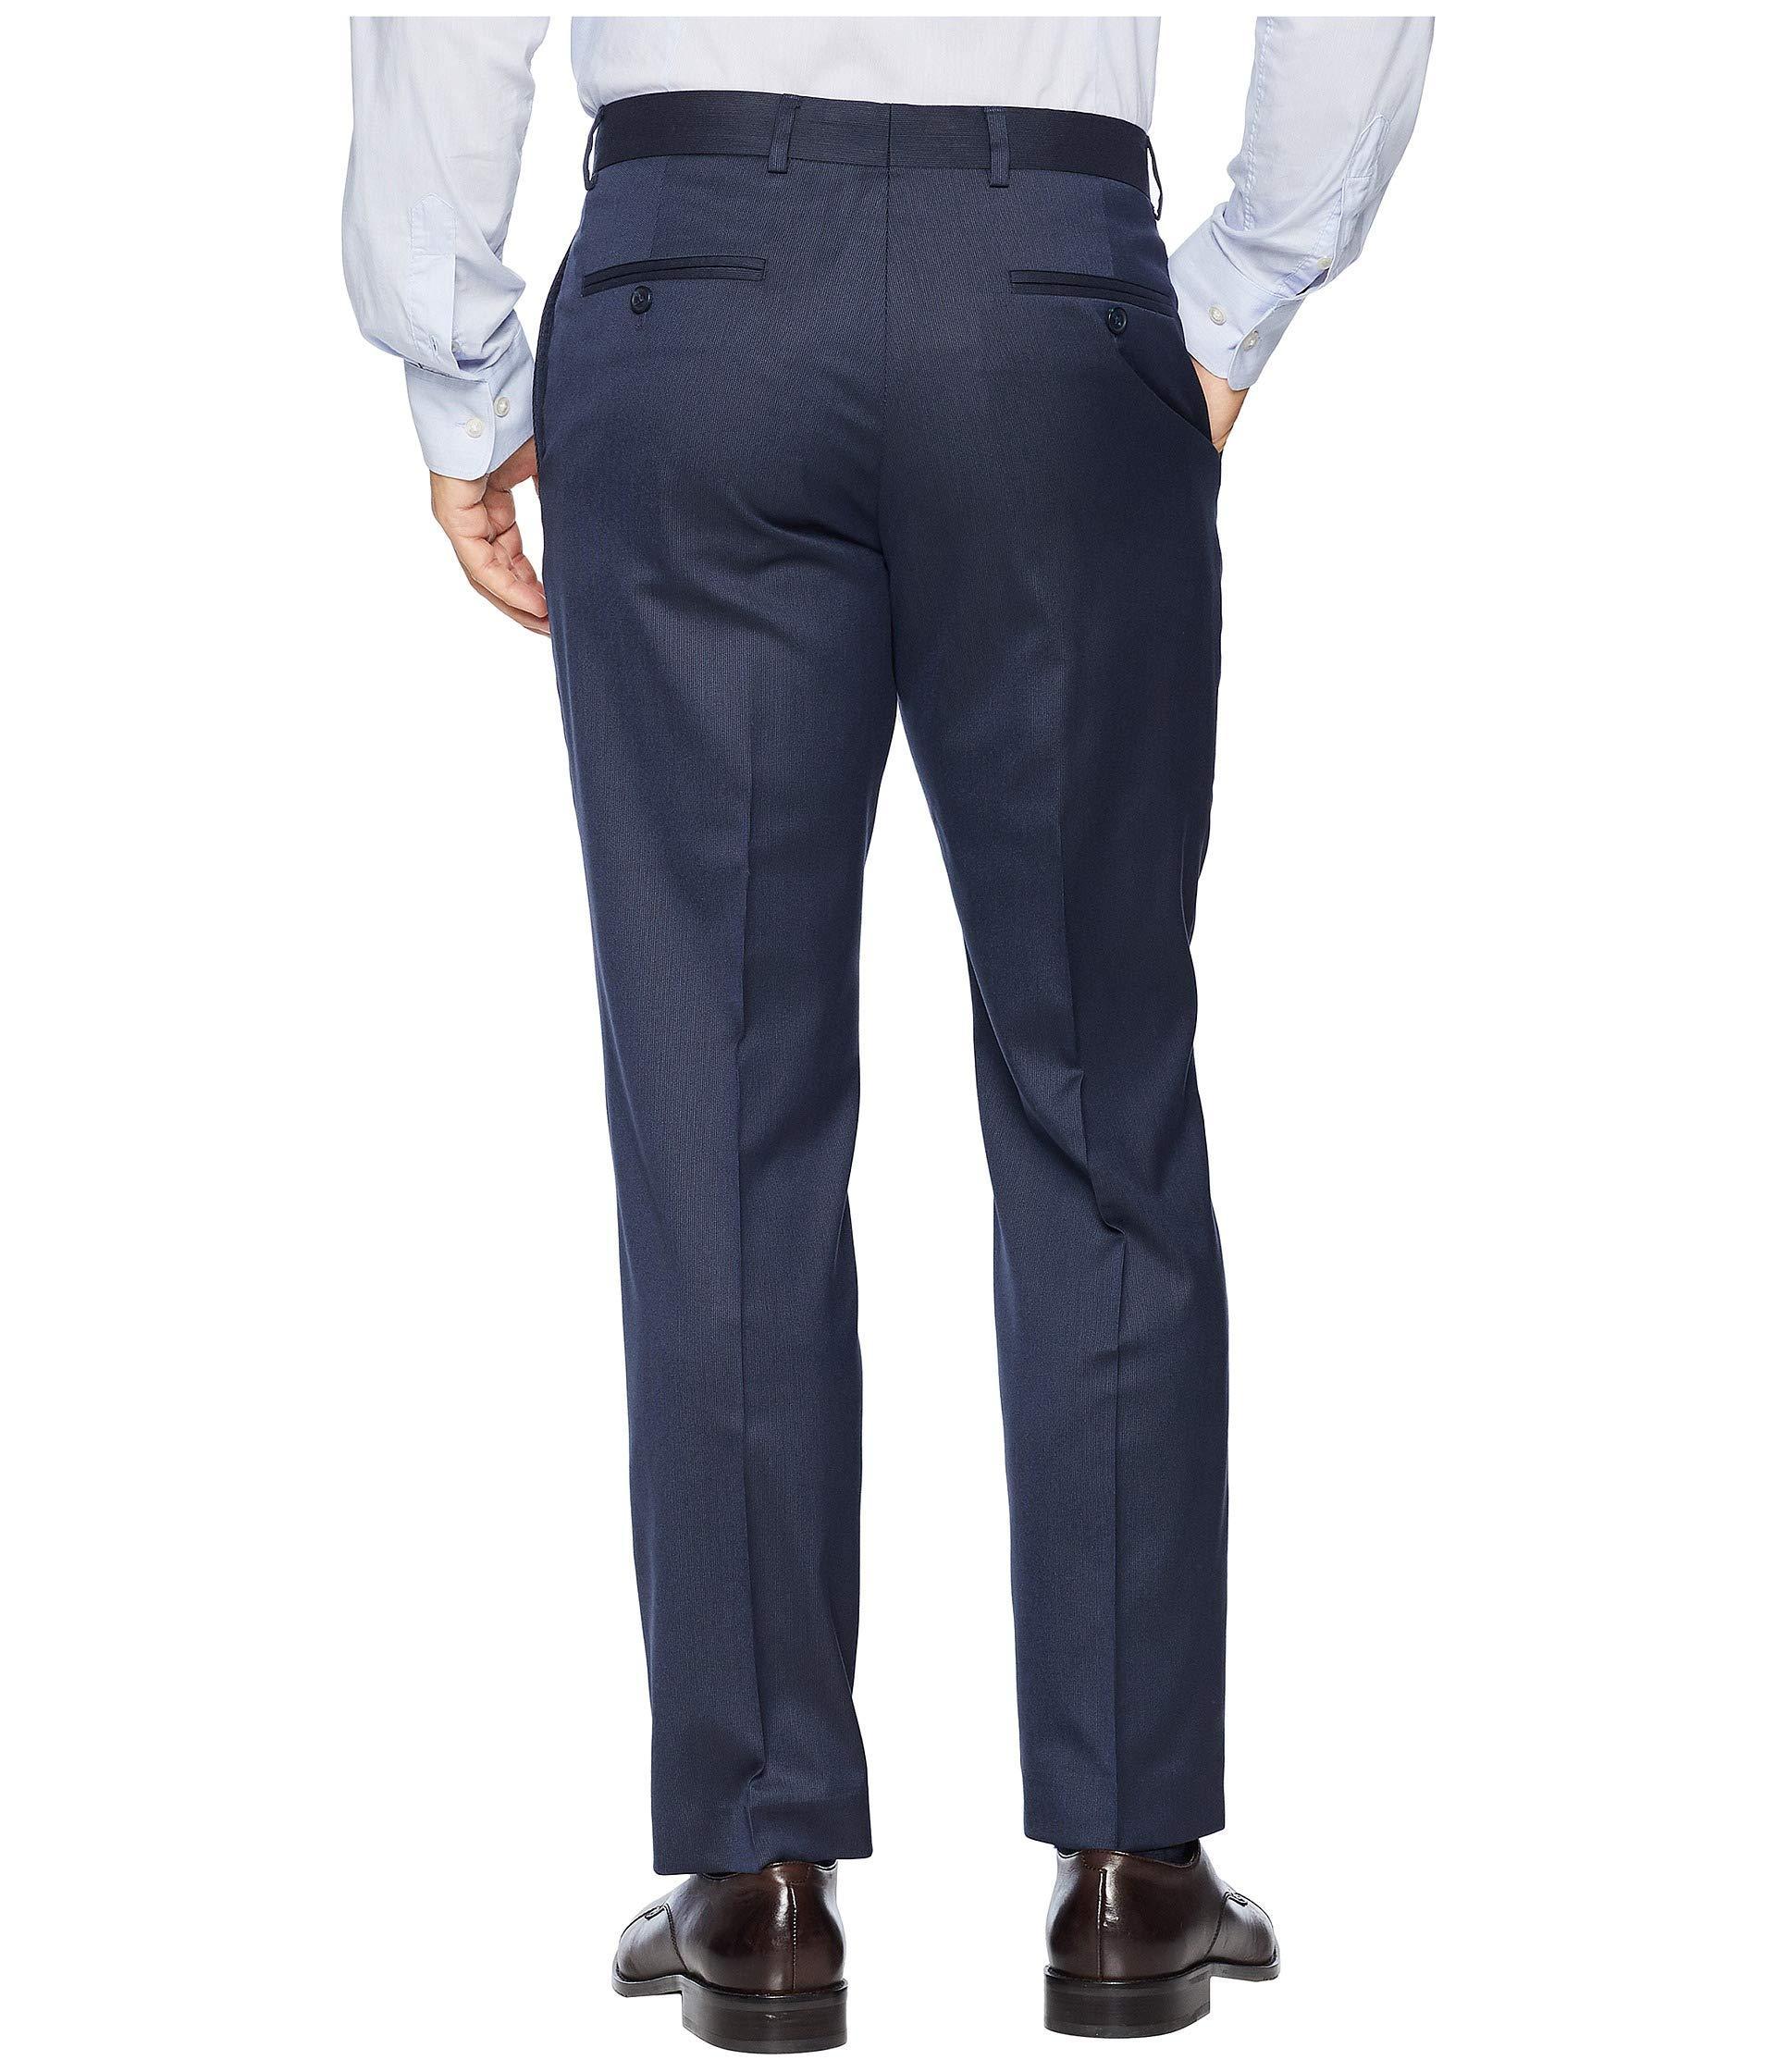 $90 DKNY Men/'s Side-Stripe Chino Slim Straight Flat Pants 32 x 32 Navy Blue